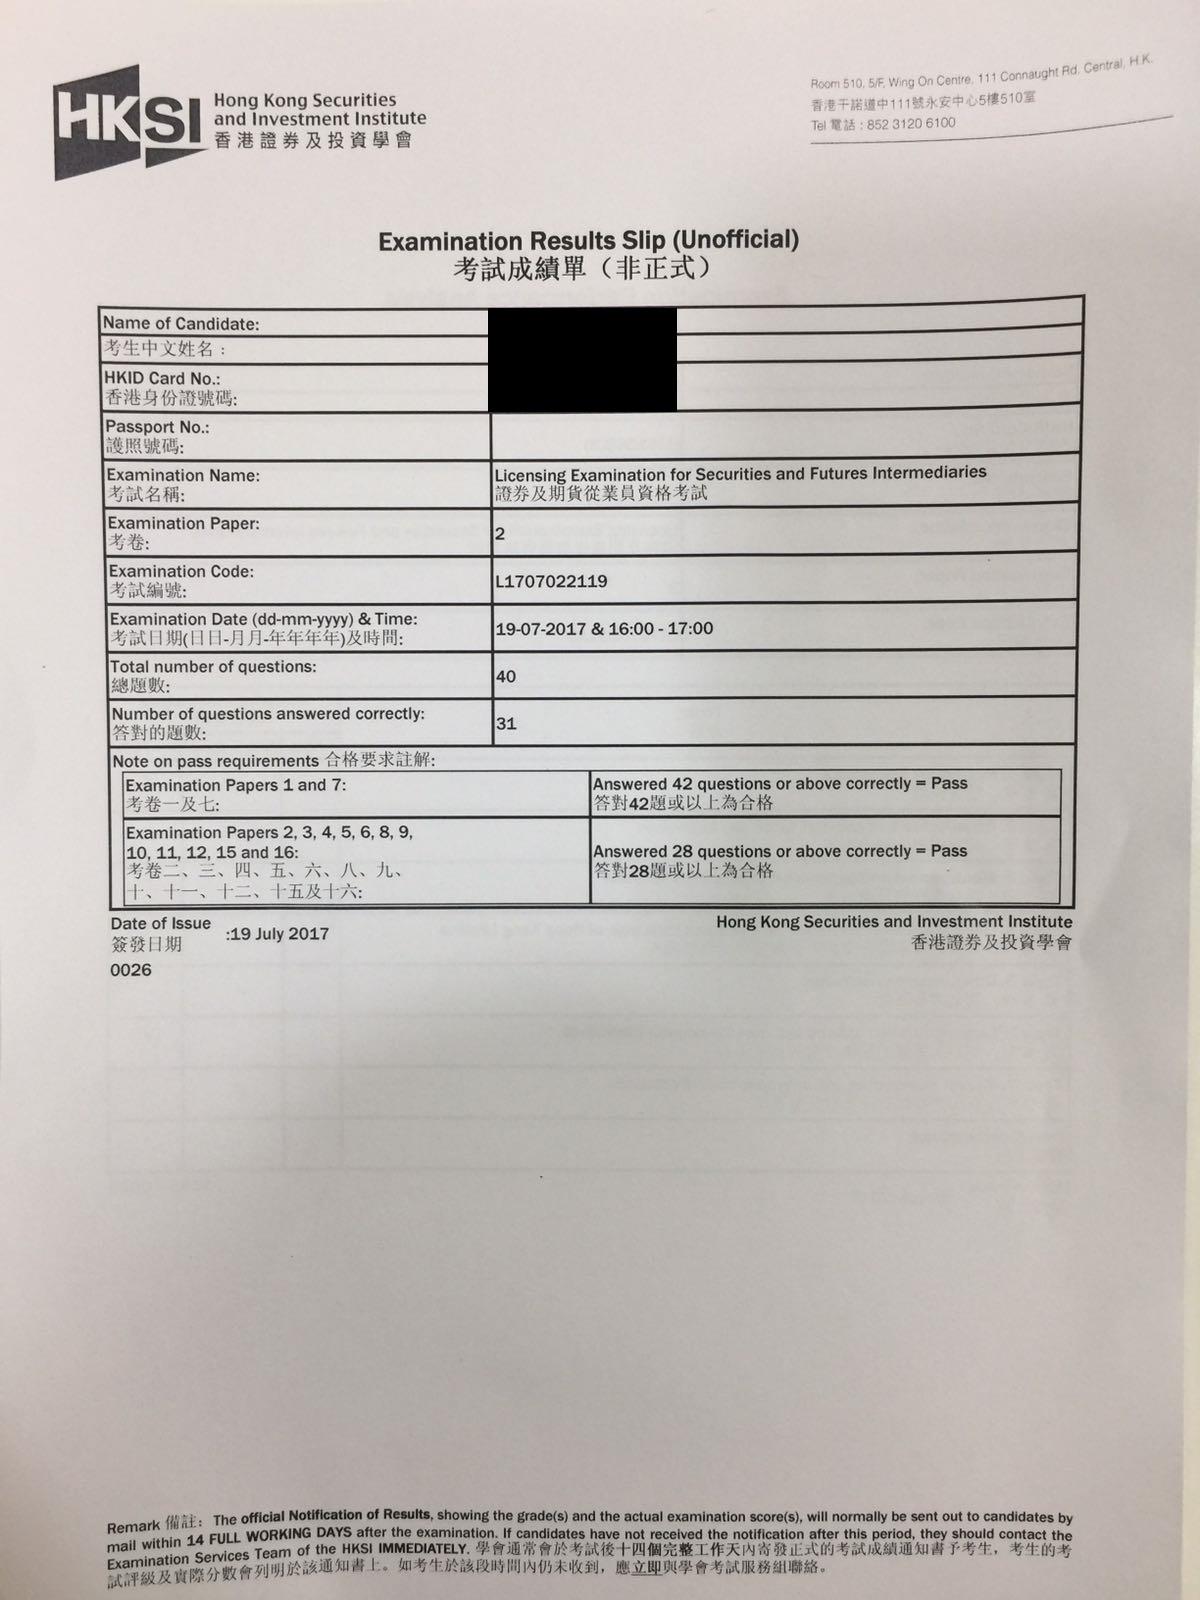 SJ 19/7/2017 LE Paper 2 證券期貨從業員資格考試卷二 Pass